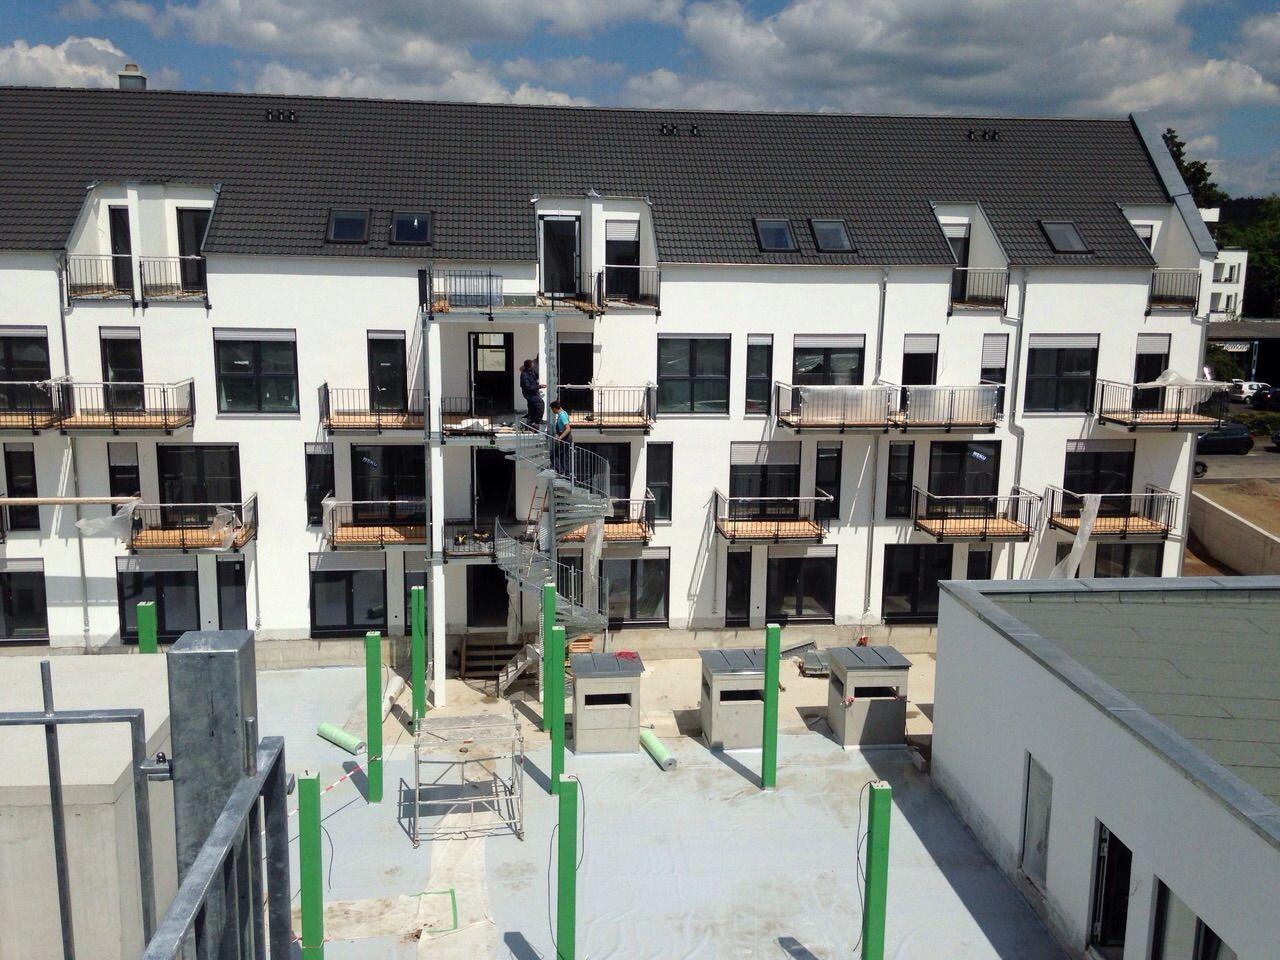 Bautenstand 28.05.2015 Aschaffenburg, Immobilien, Bau